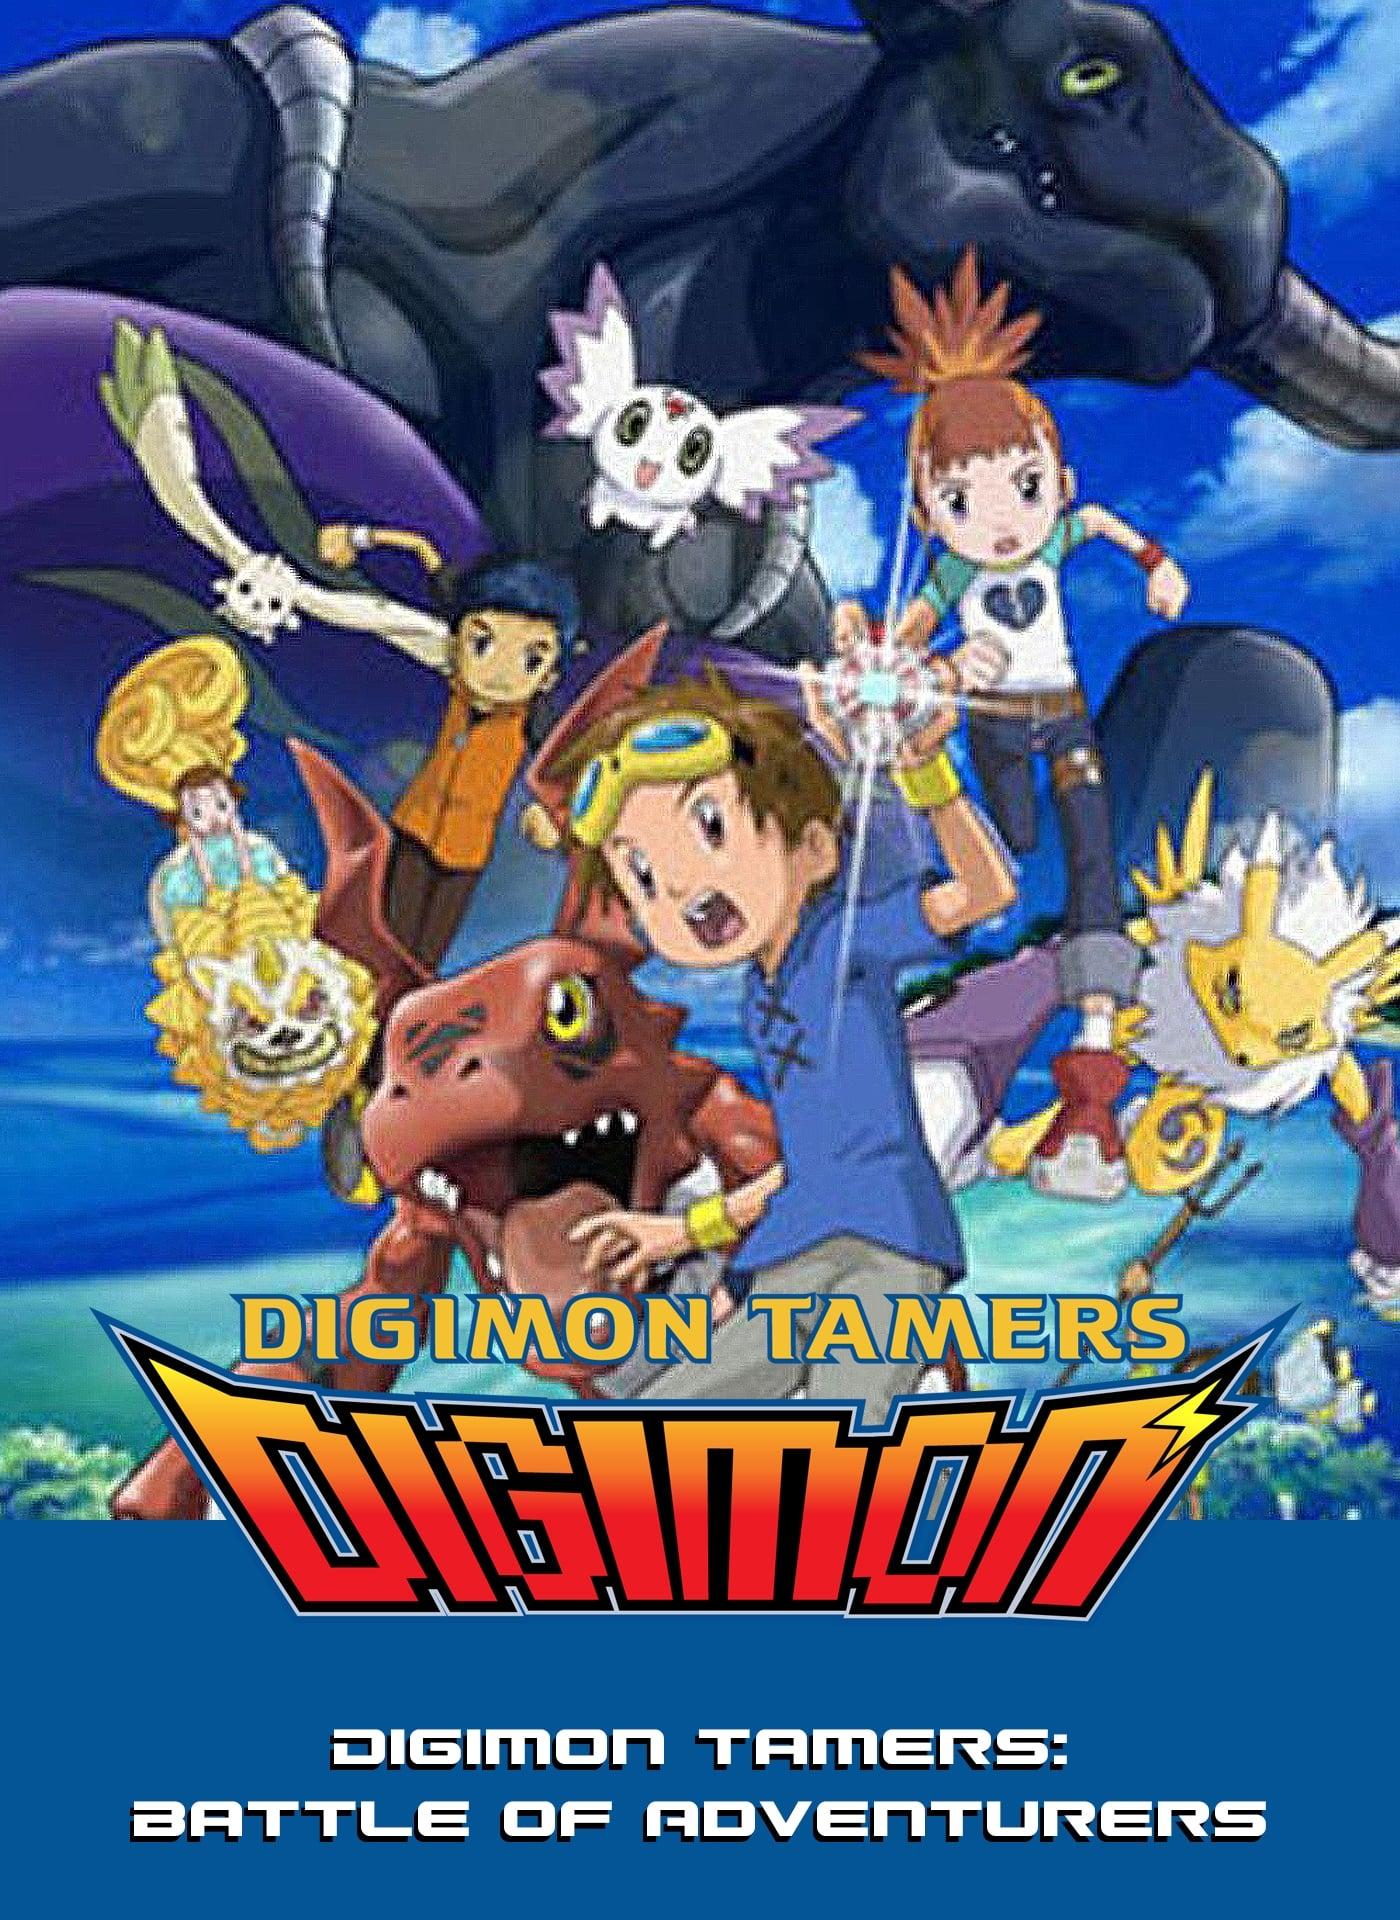 Digimon Tamers: Battle of Adventurers (2001)